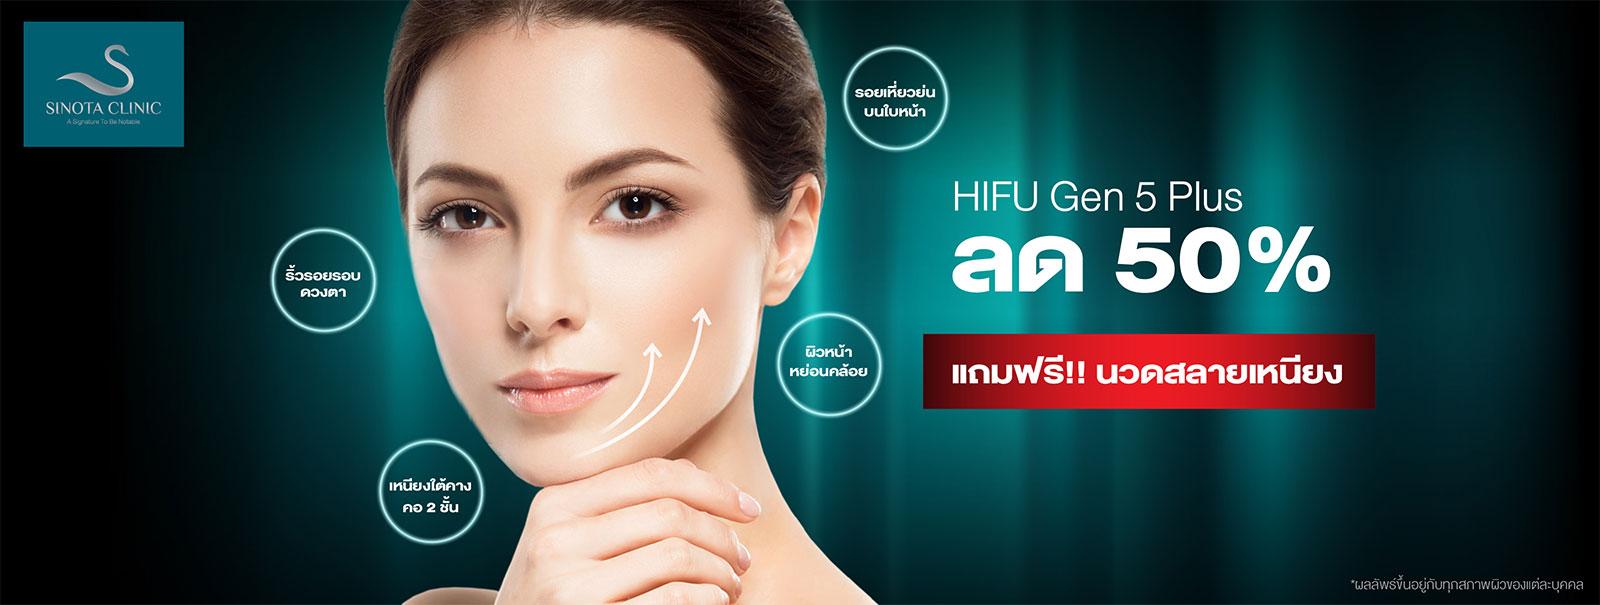 HIFU Gen 5 Plus DC 50